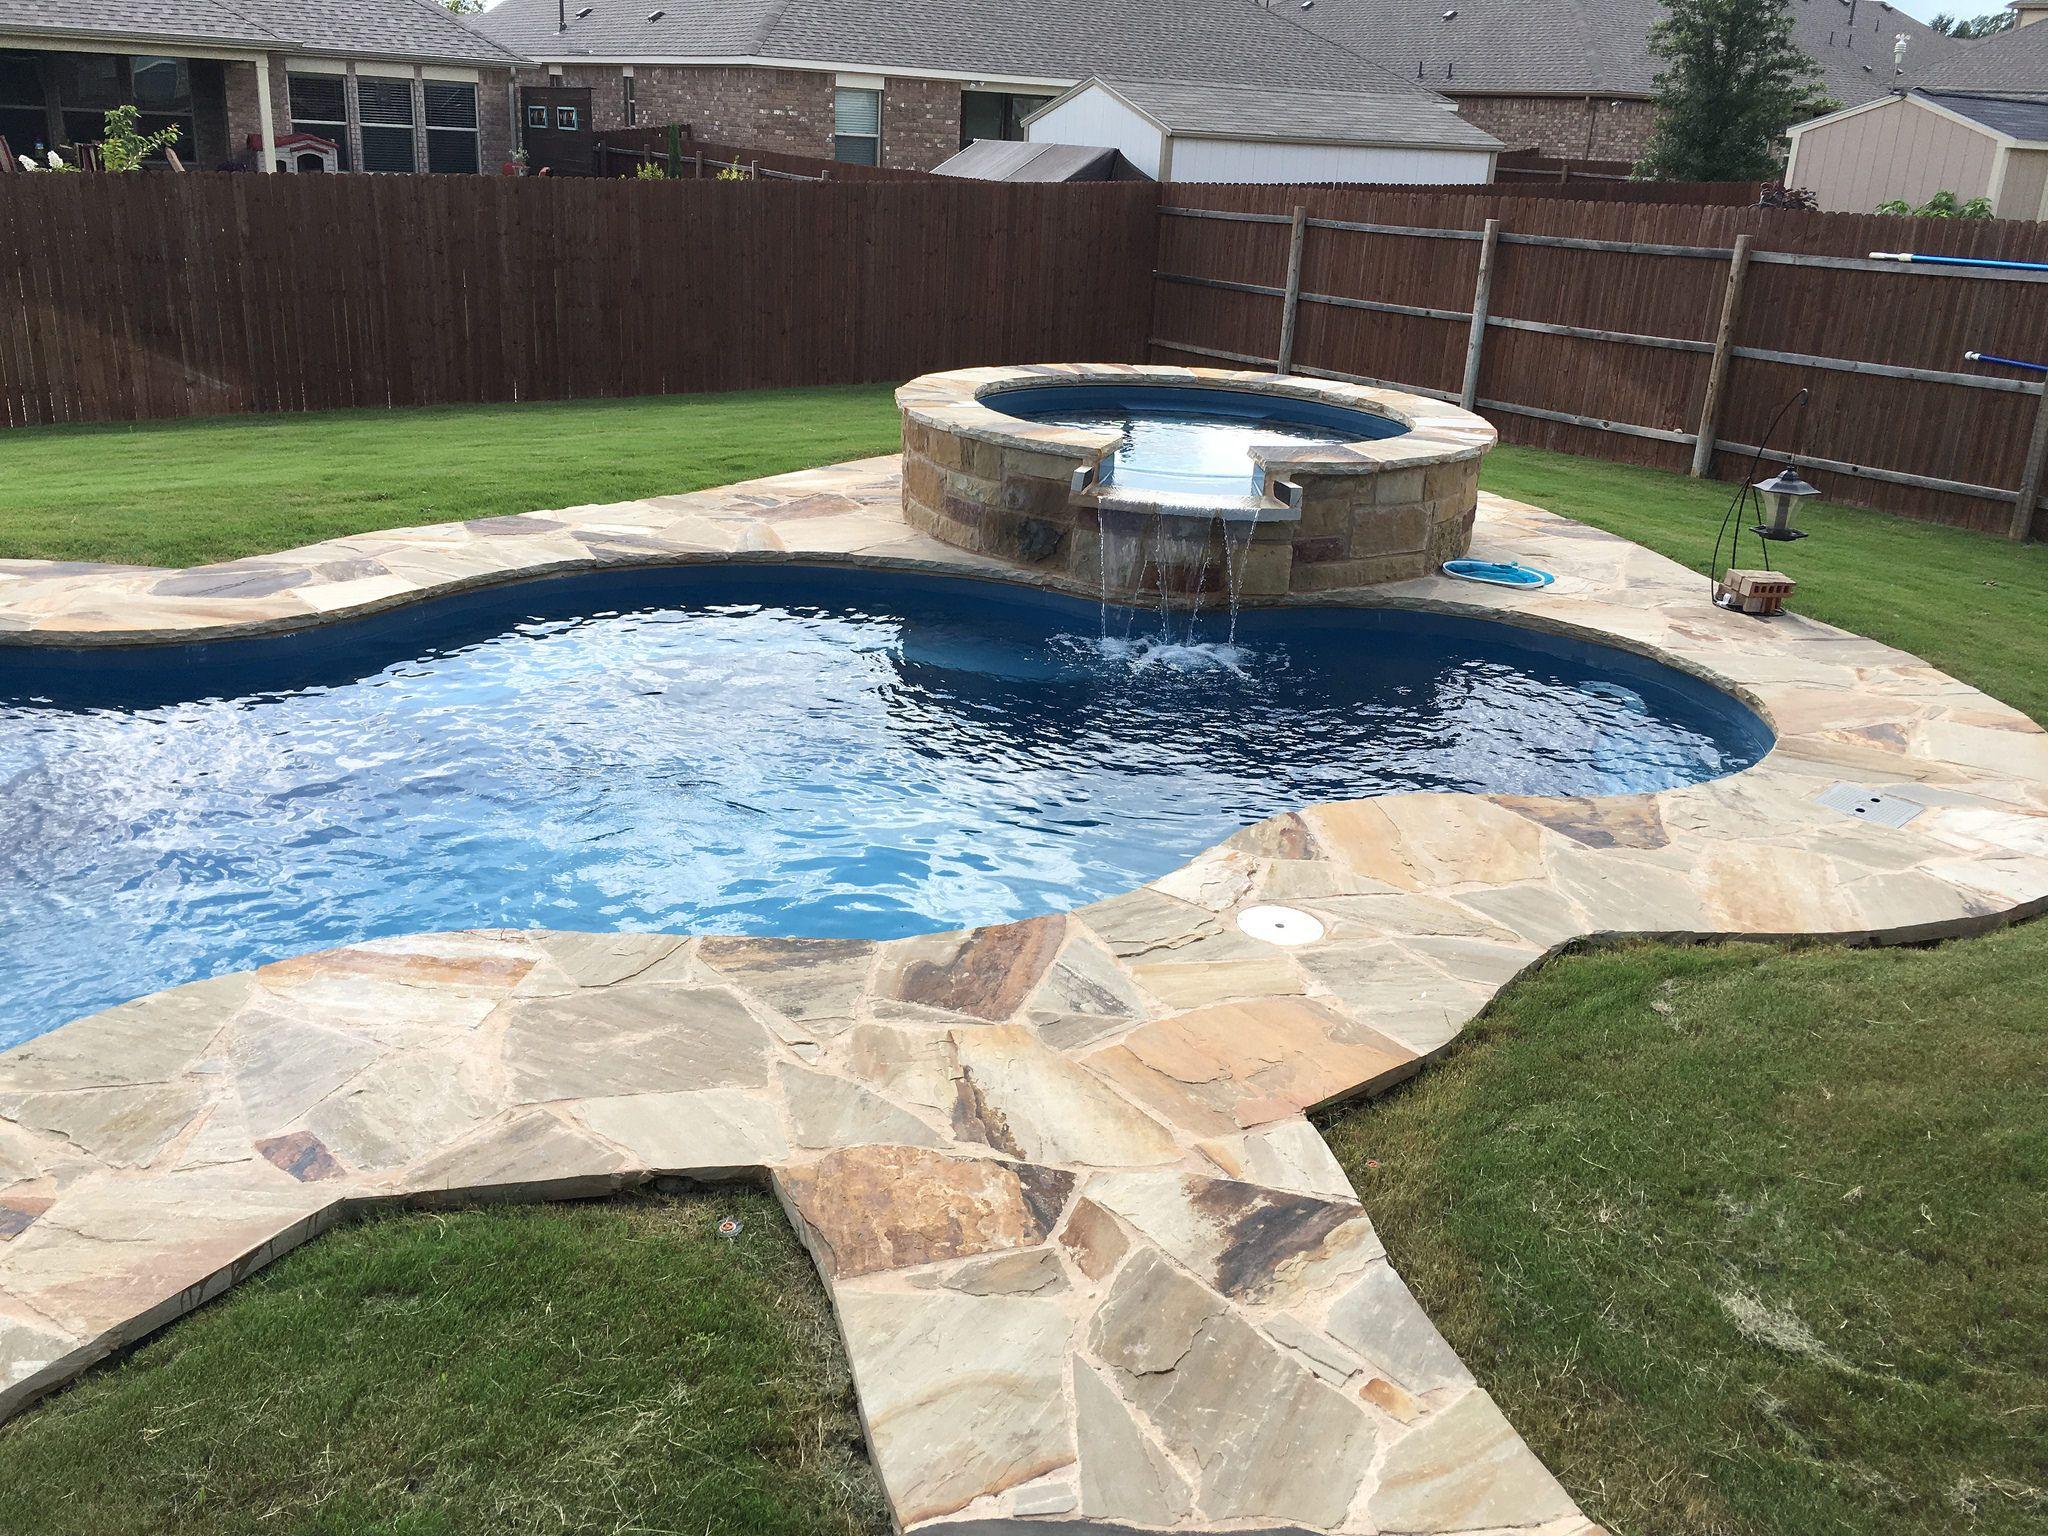 nebula and neptune spa with custom swimming pool deck stone work